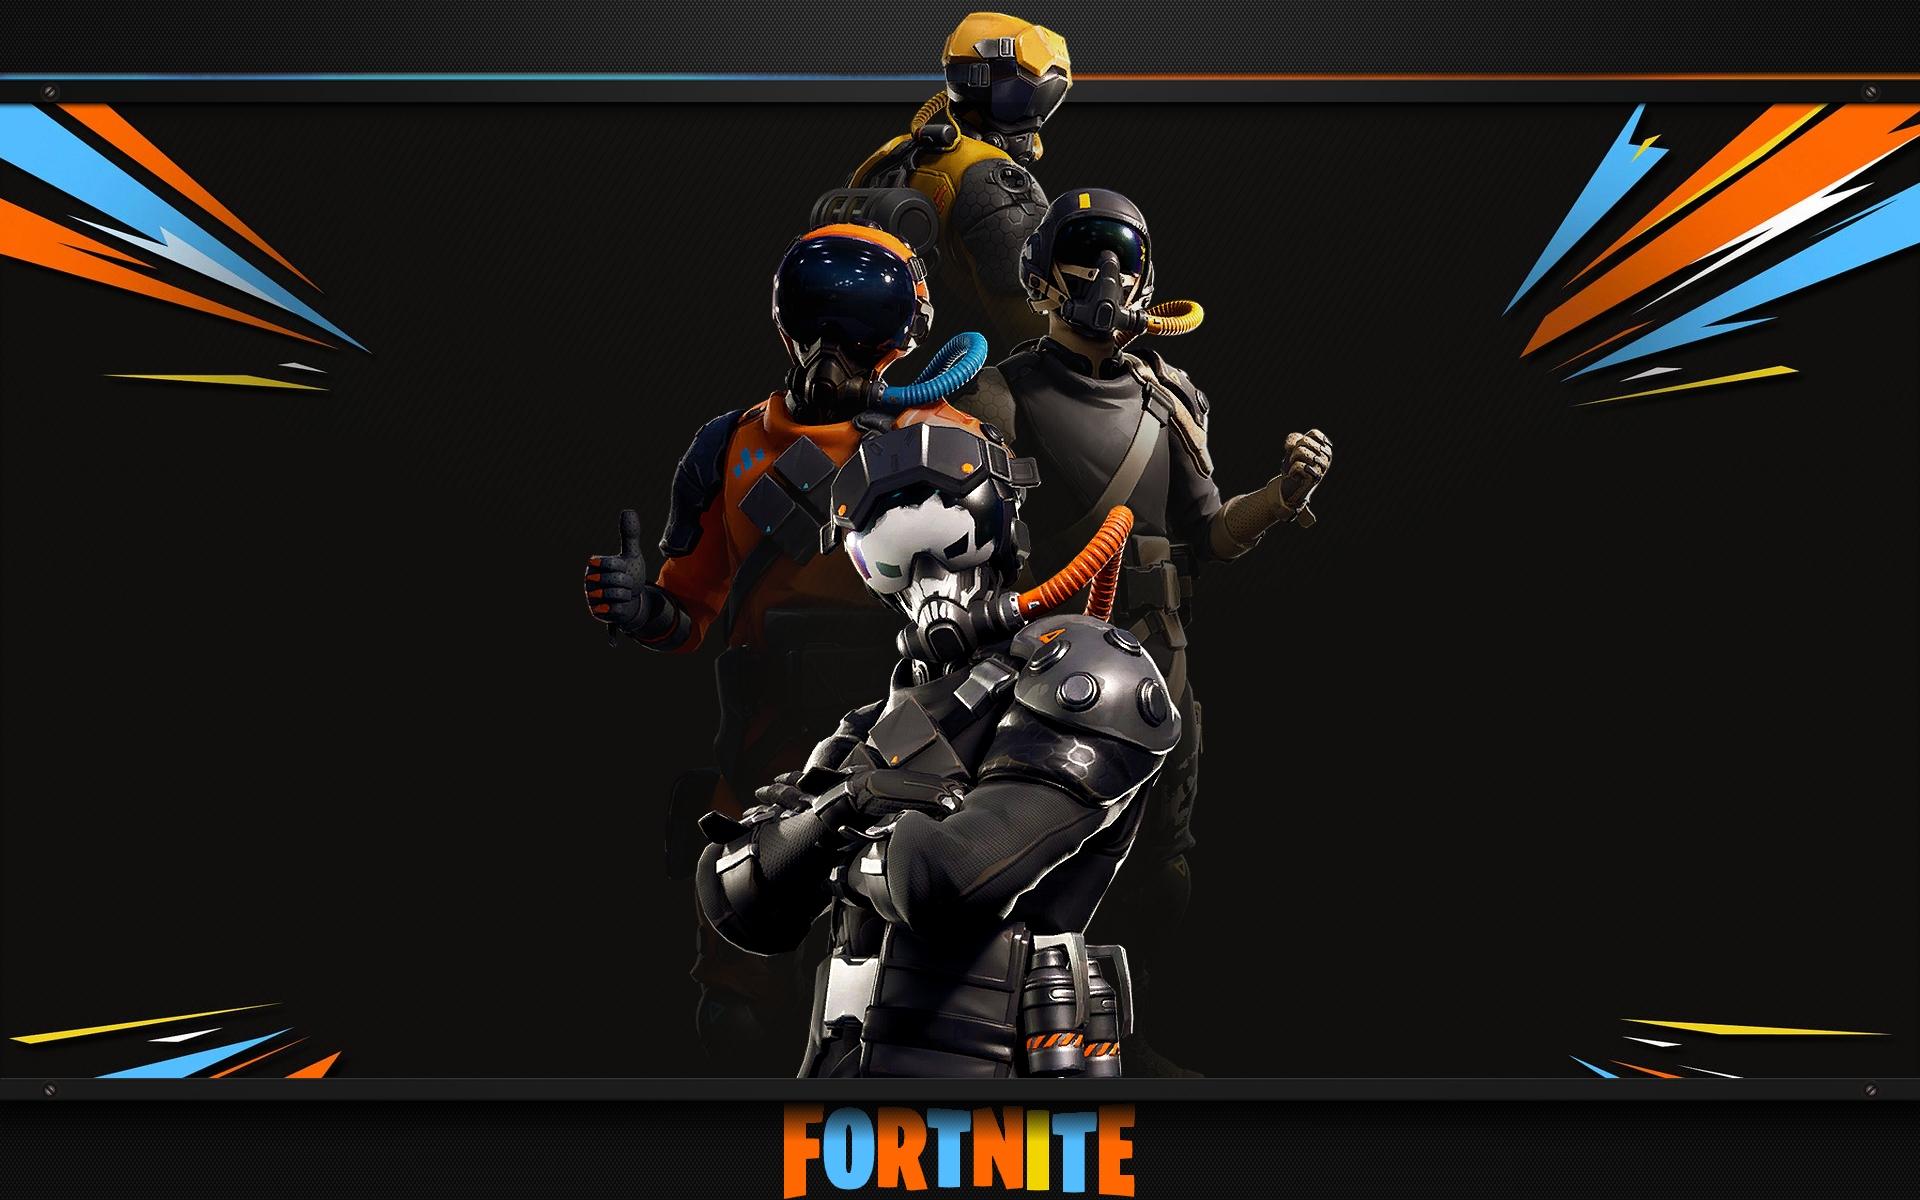 Fond Decran Style Fortnite Skin Fortnite Account Generator Alt Gen